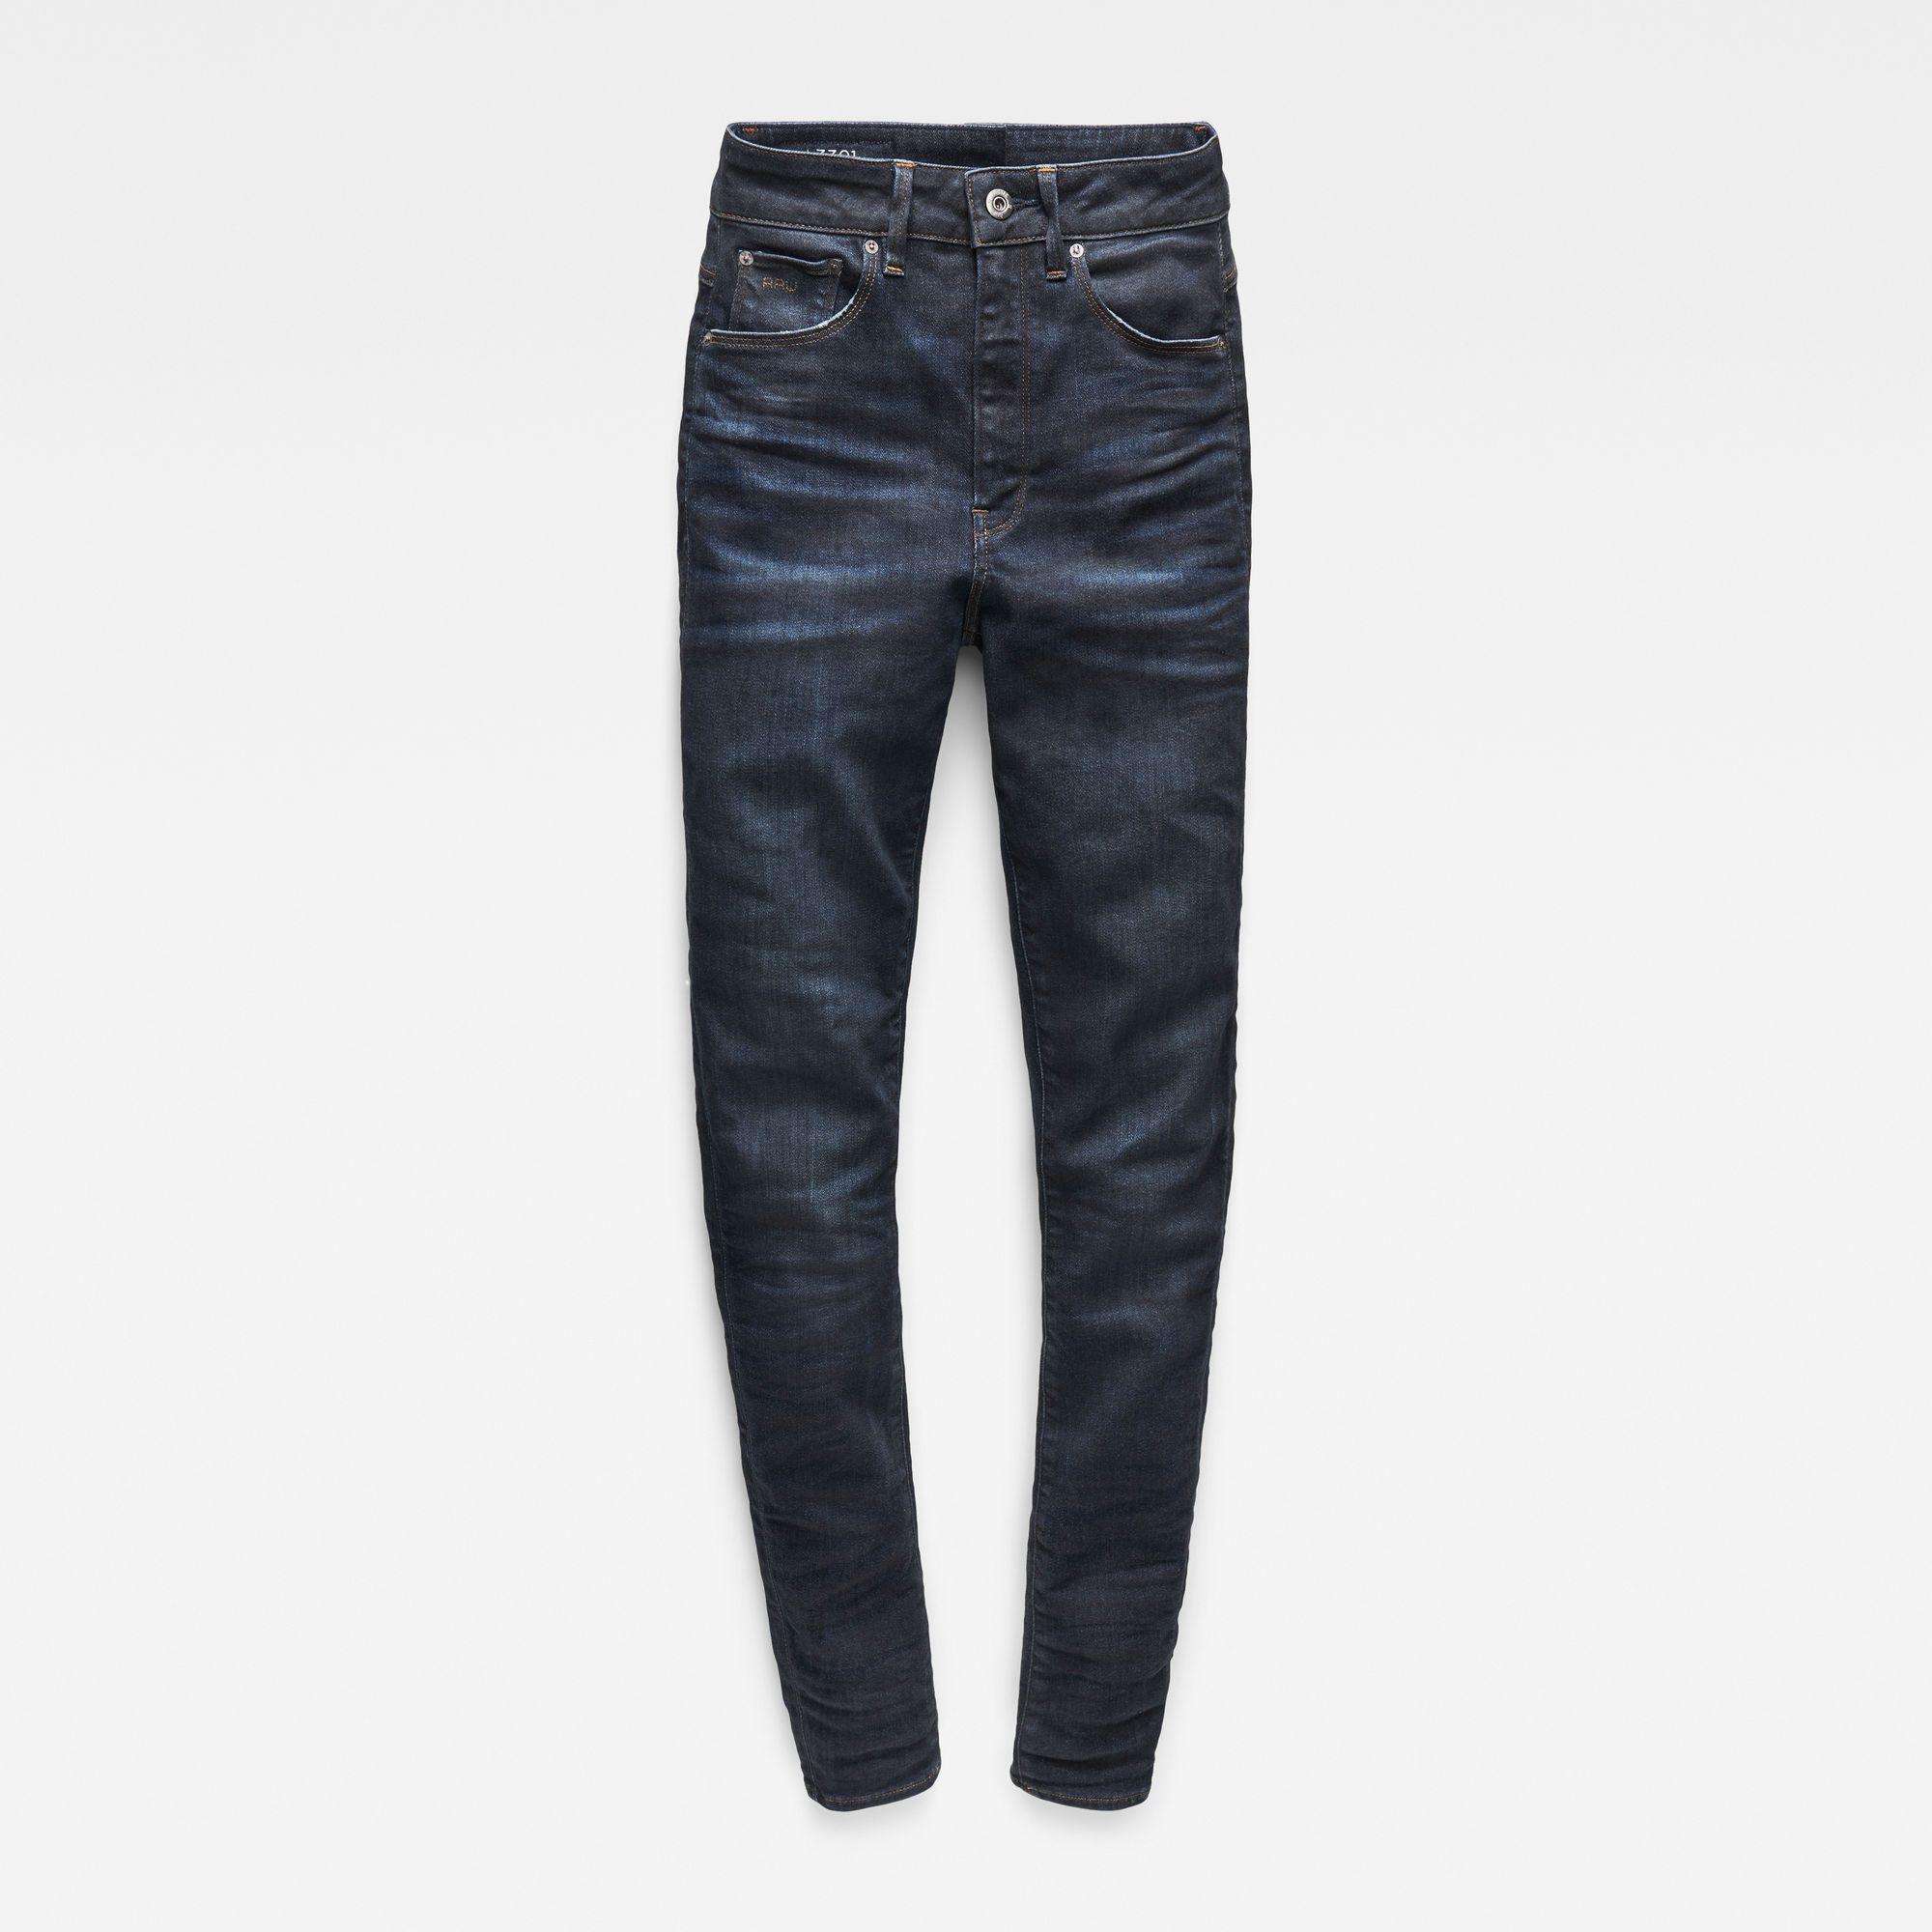 G-Star RAW 3301 Ultra High Waist Skinny Jeans